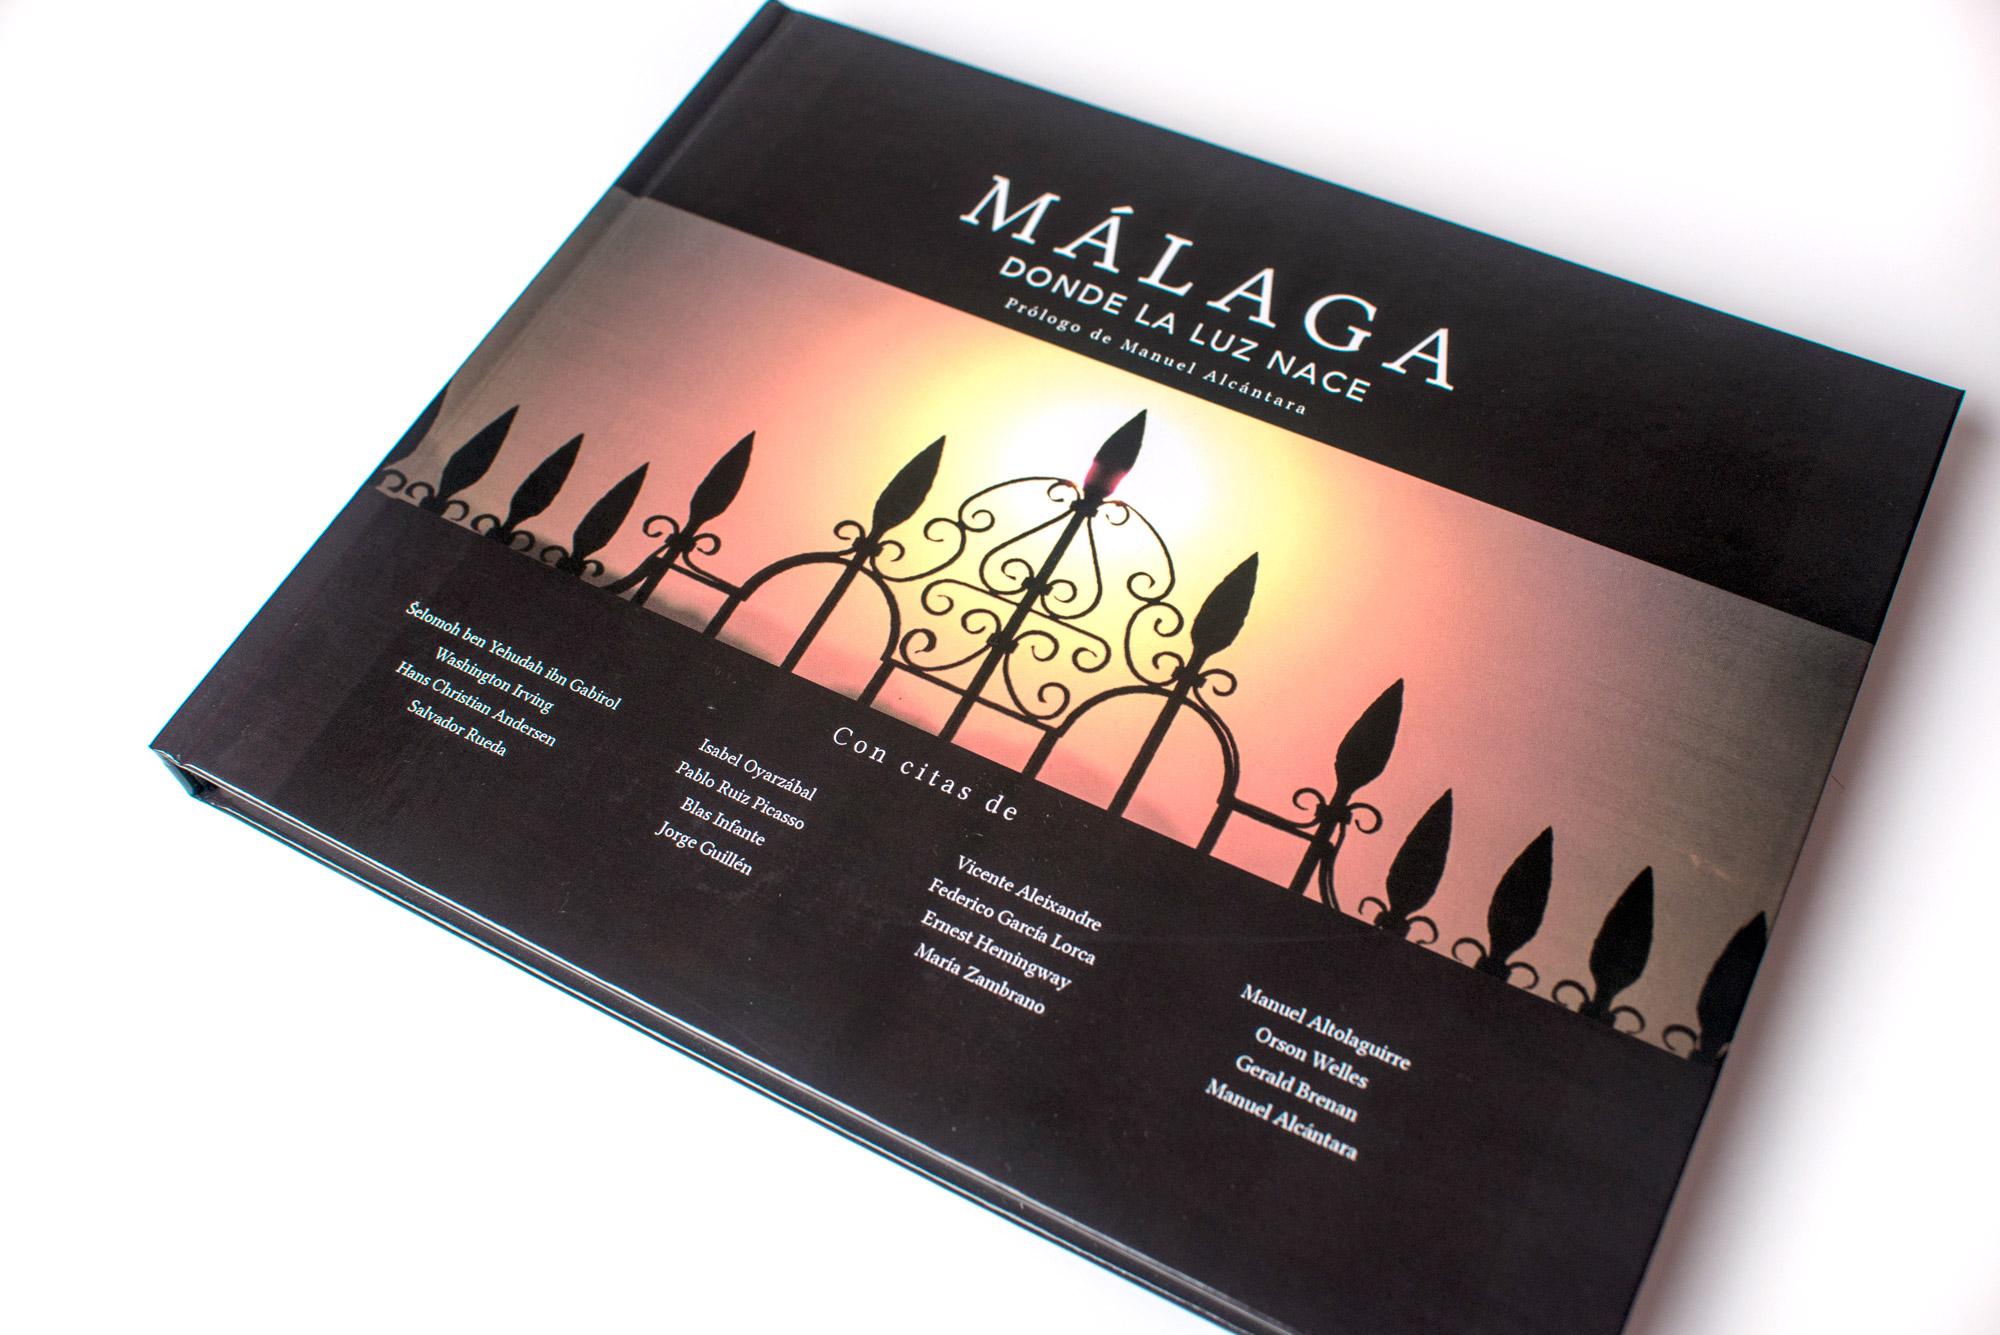 Málaga, donde la luz nace - Diseño Editorial - FANS MARKETING MÁLAGA